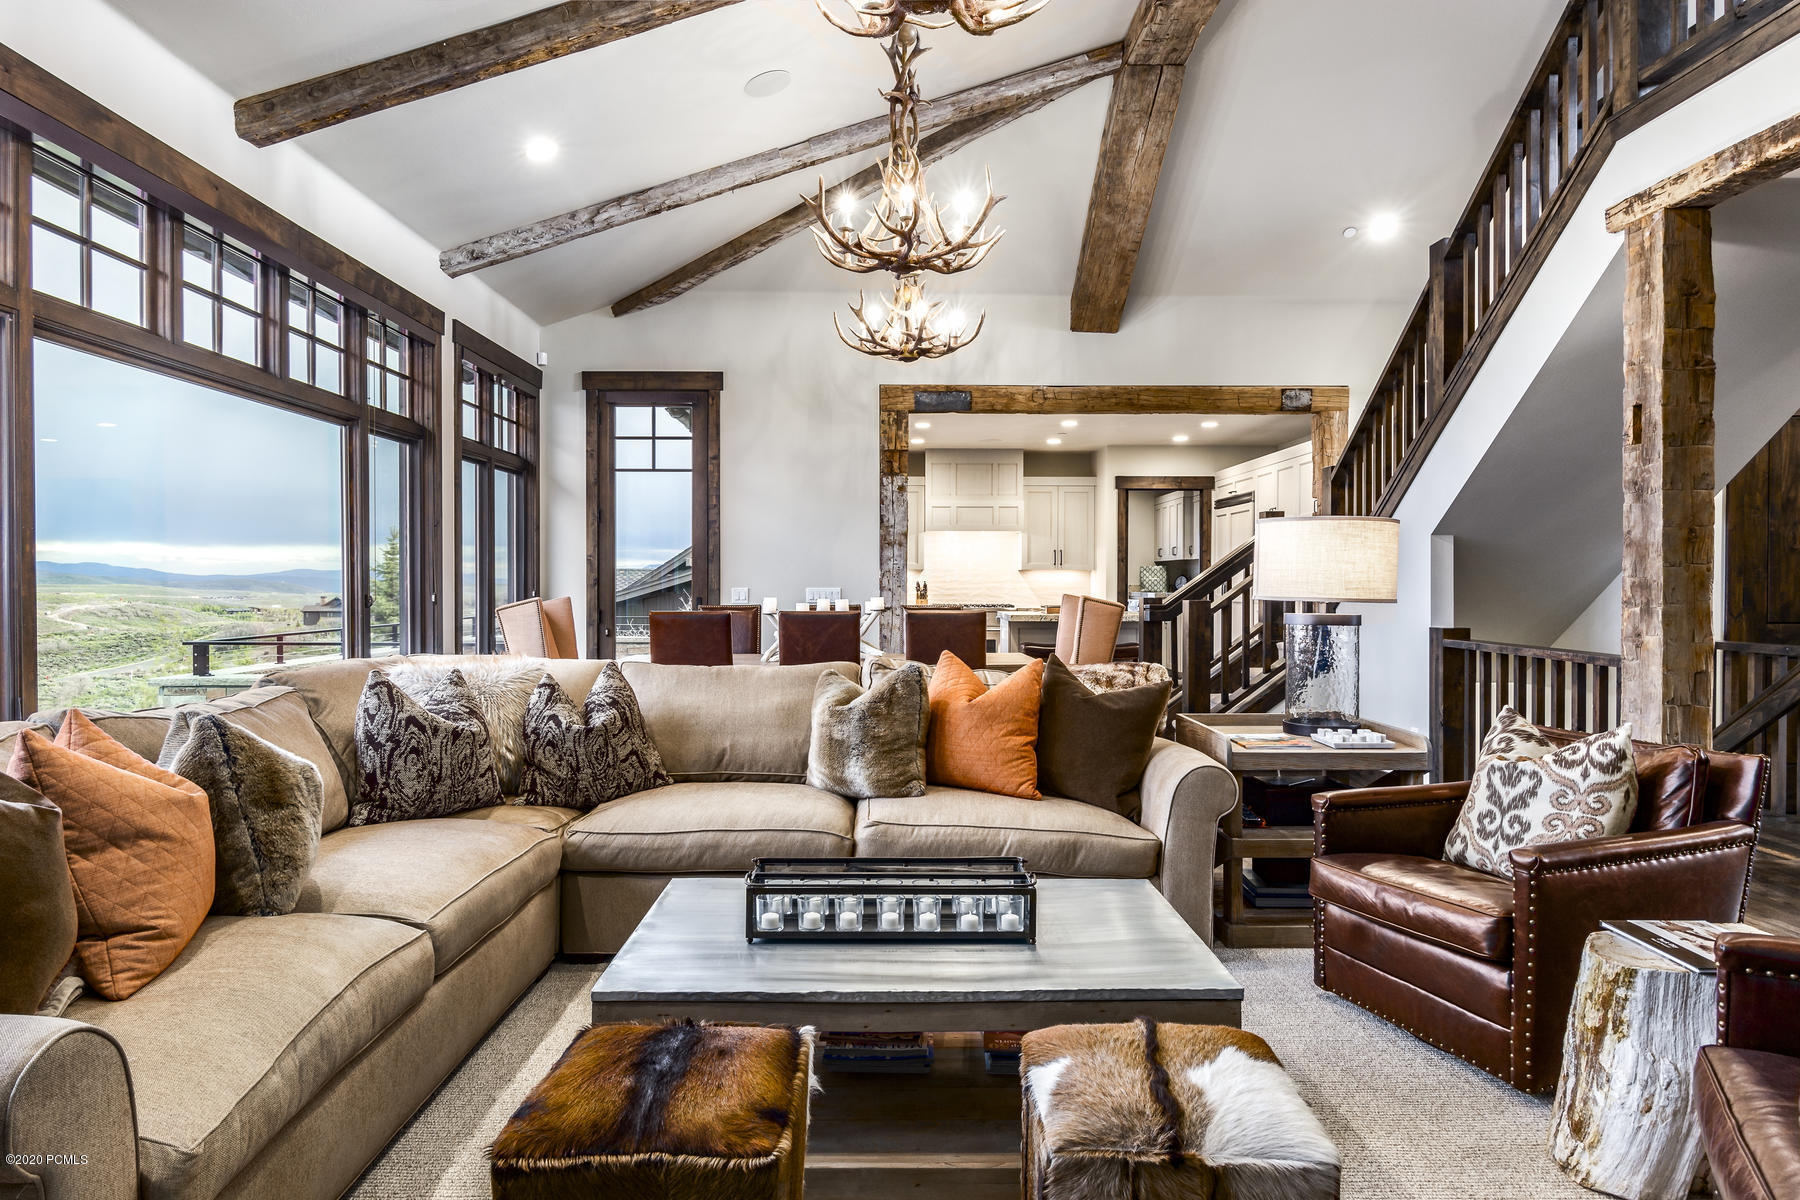 9468 Dye Cabins Drive, Park City, Utah 84098, 4 Bedrooms Bedrooms, ,4 BathroomsBathrooms,Single Family,For Sale,Dye Cabins,20190109112430415765000000